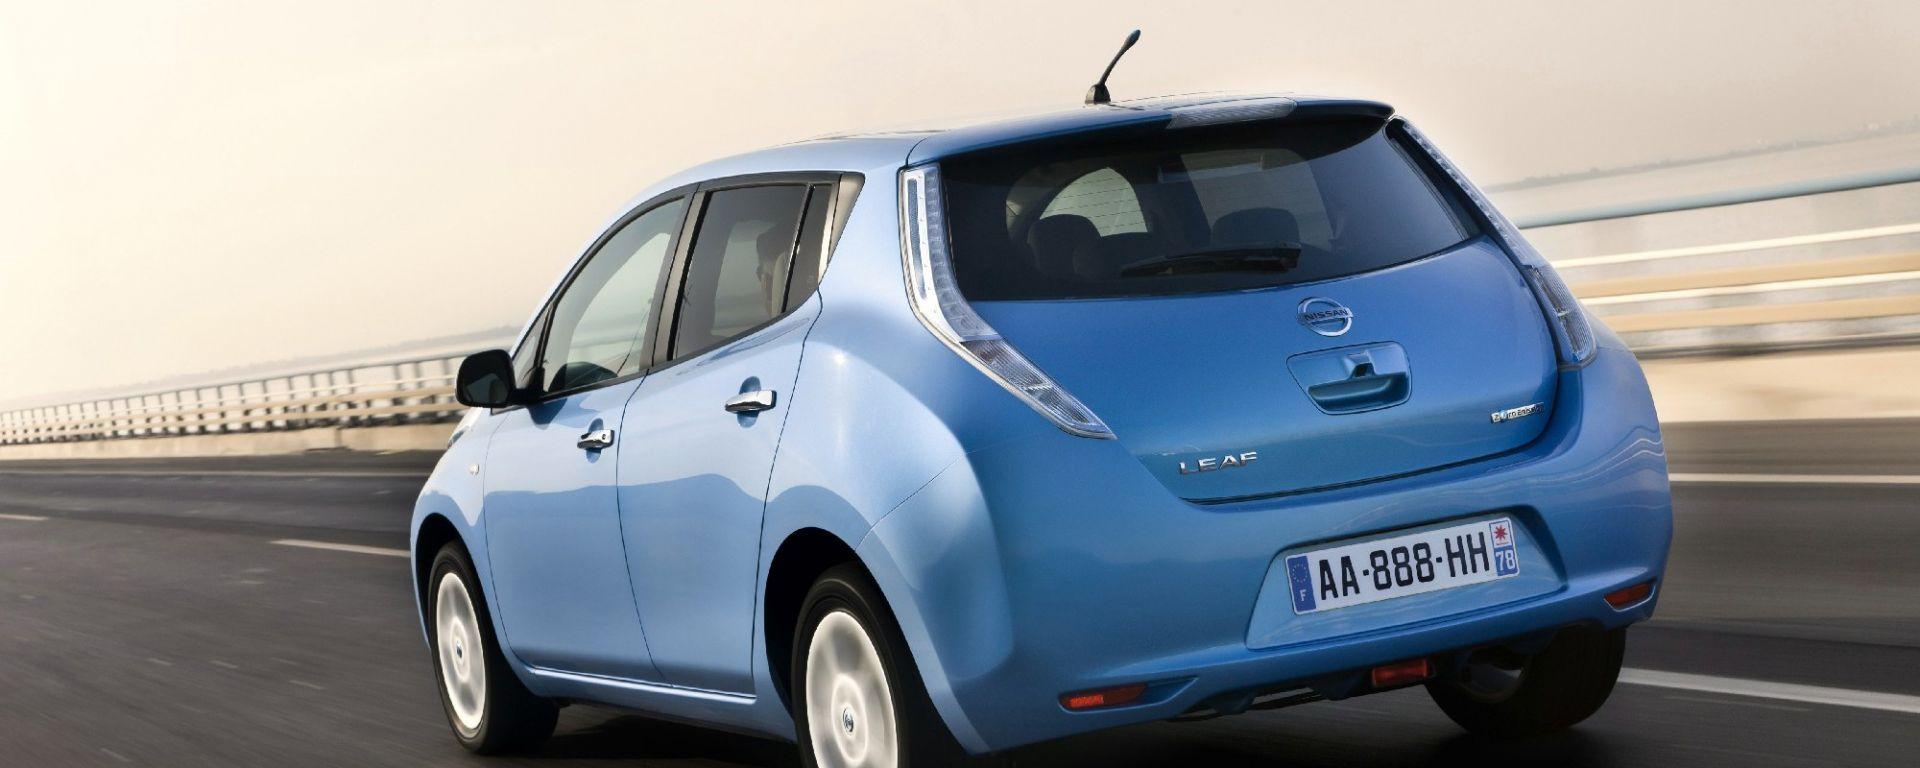 Nissan LEAF, ma quanto mi costi?